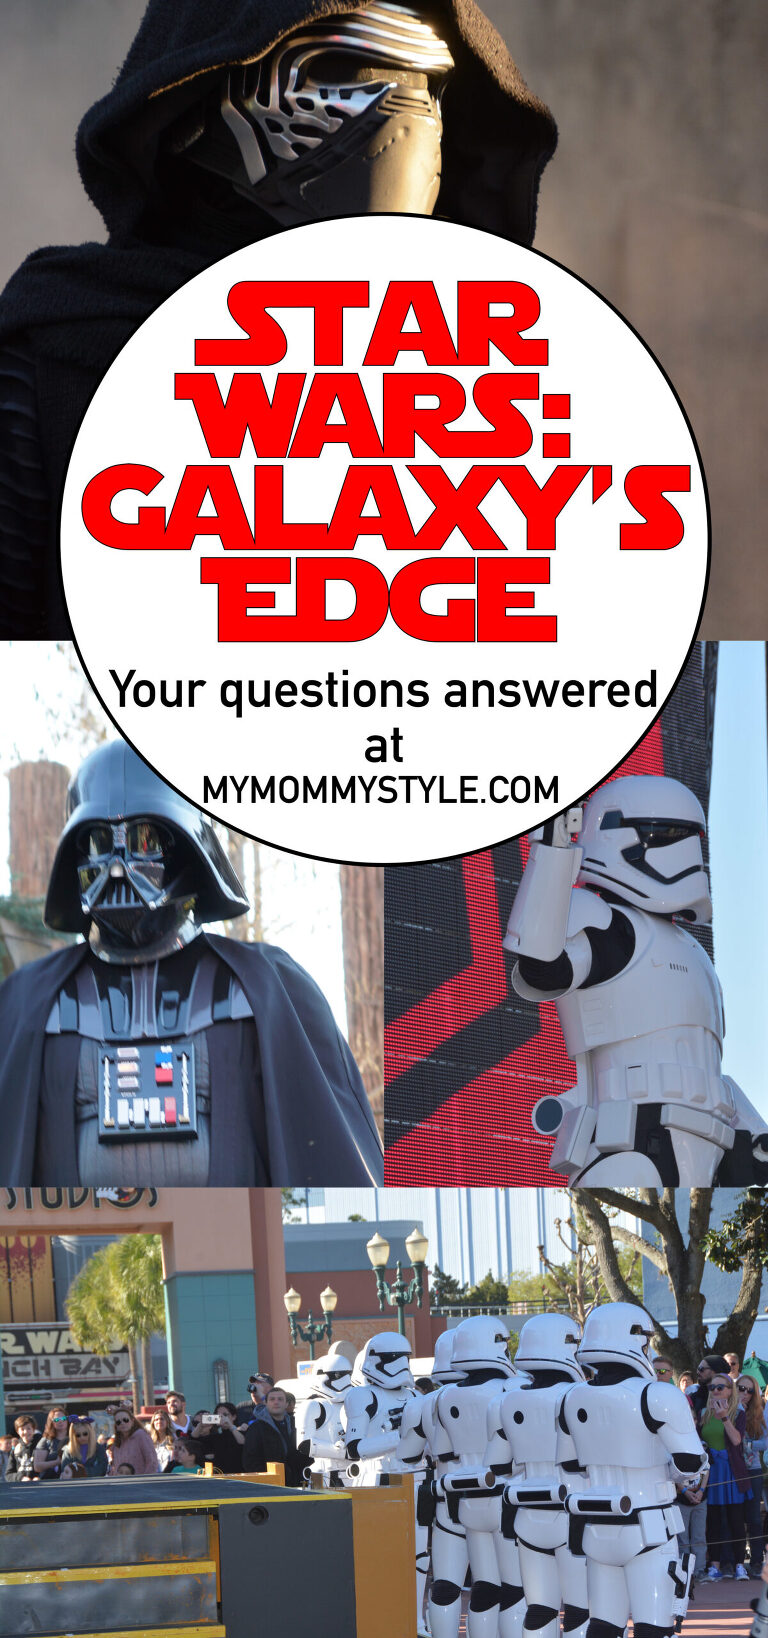 Star Wars Galazy's Edge at Disney